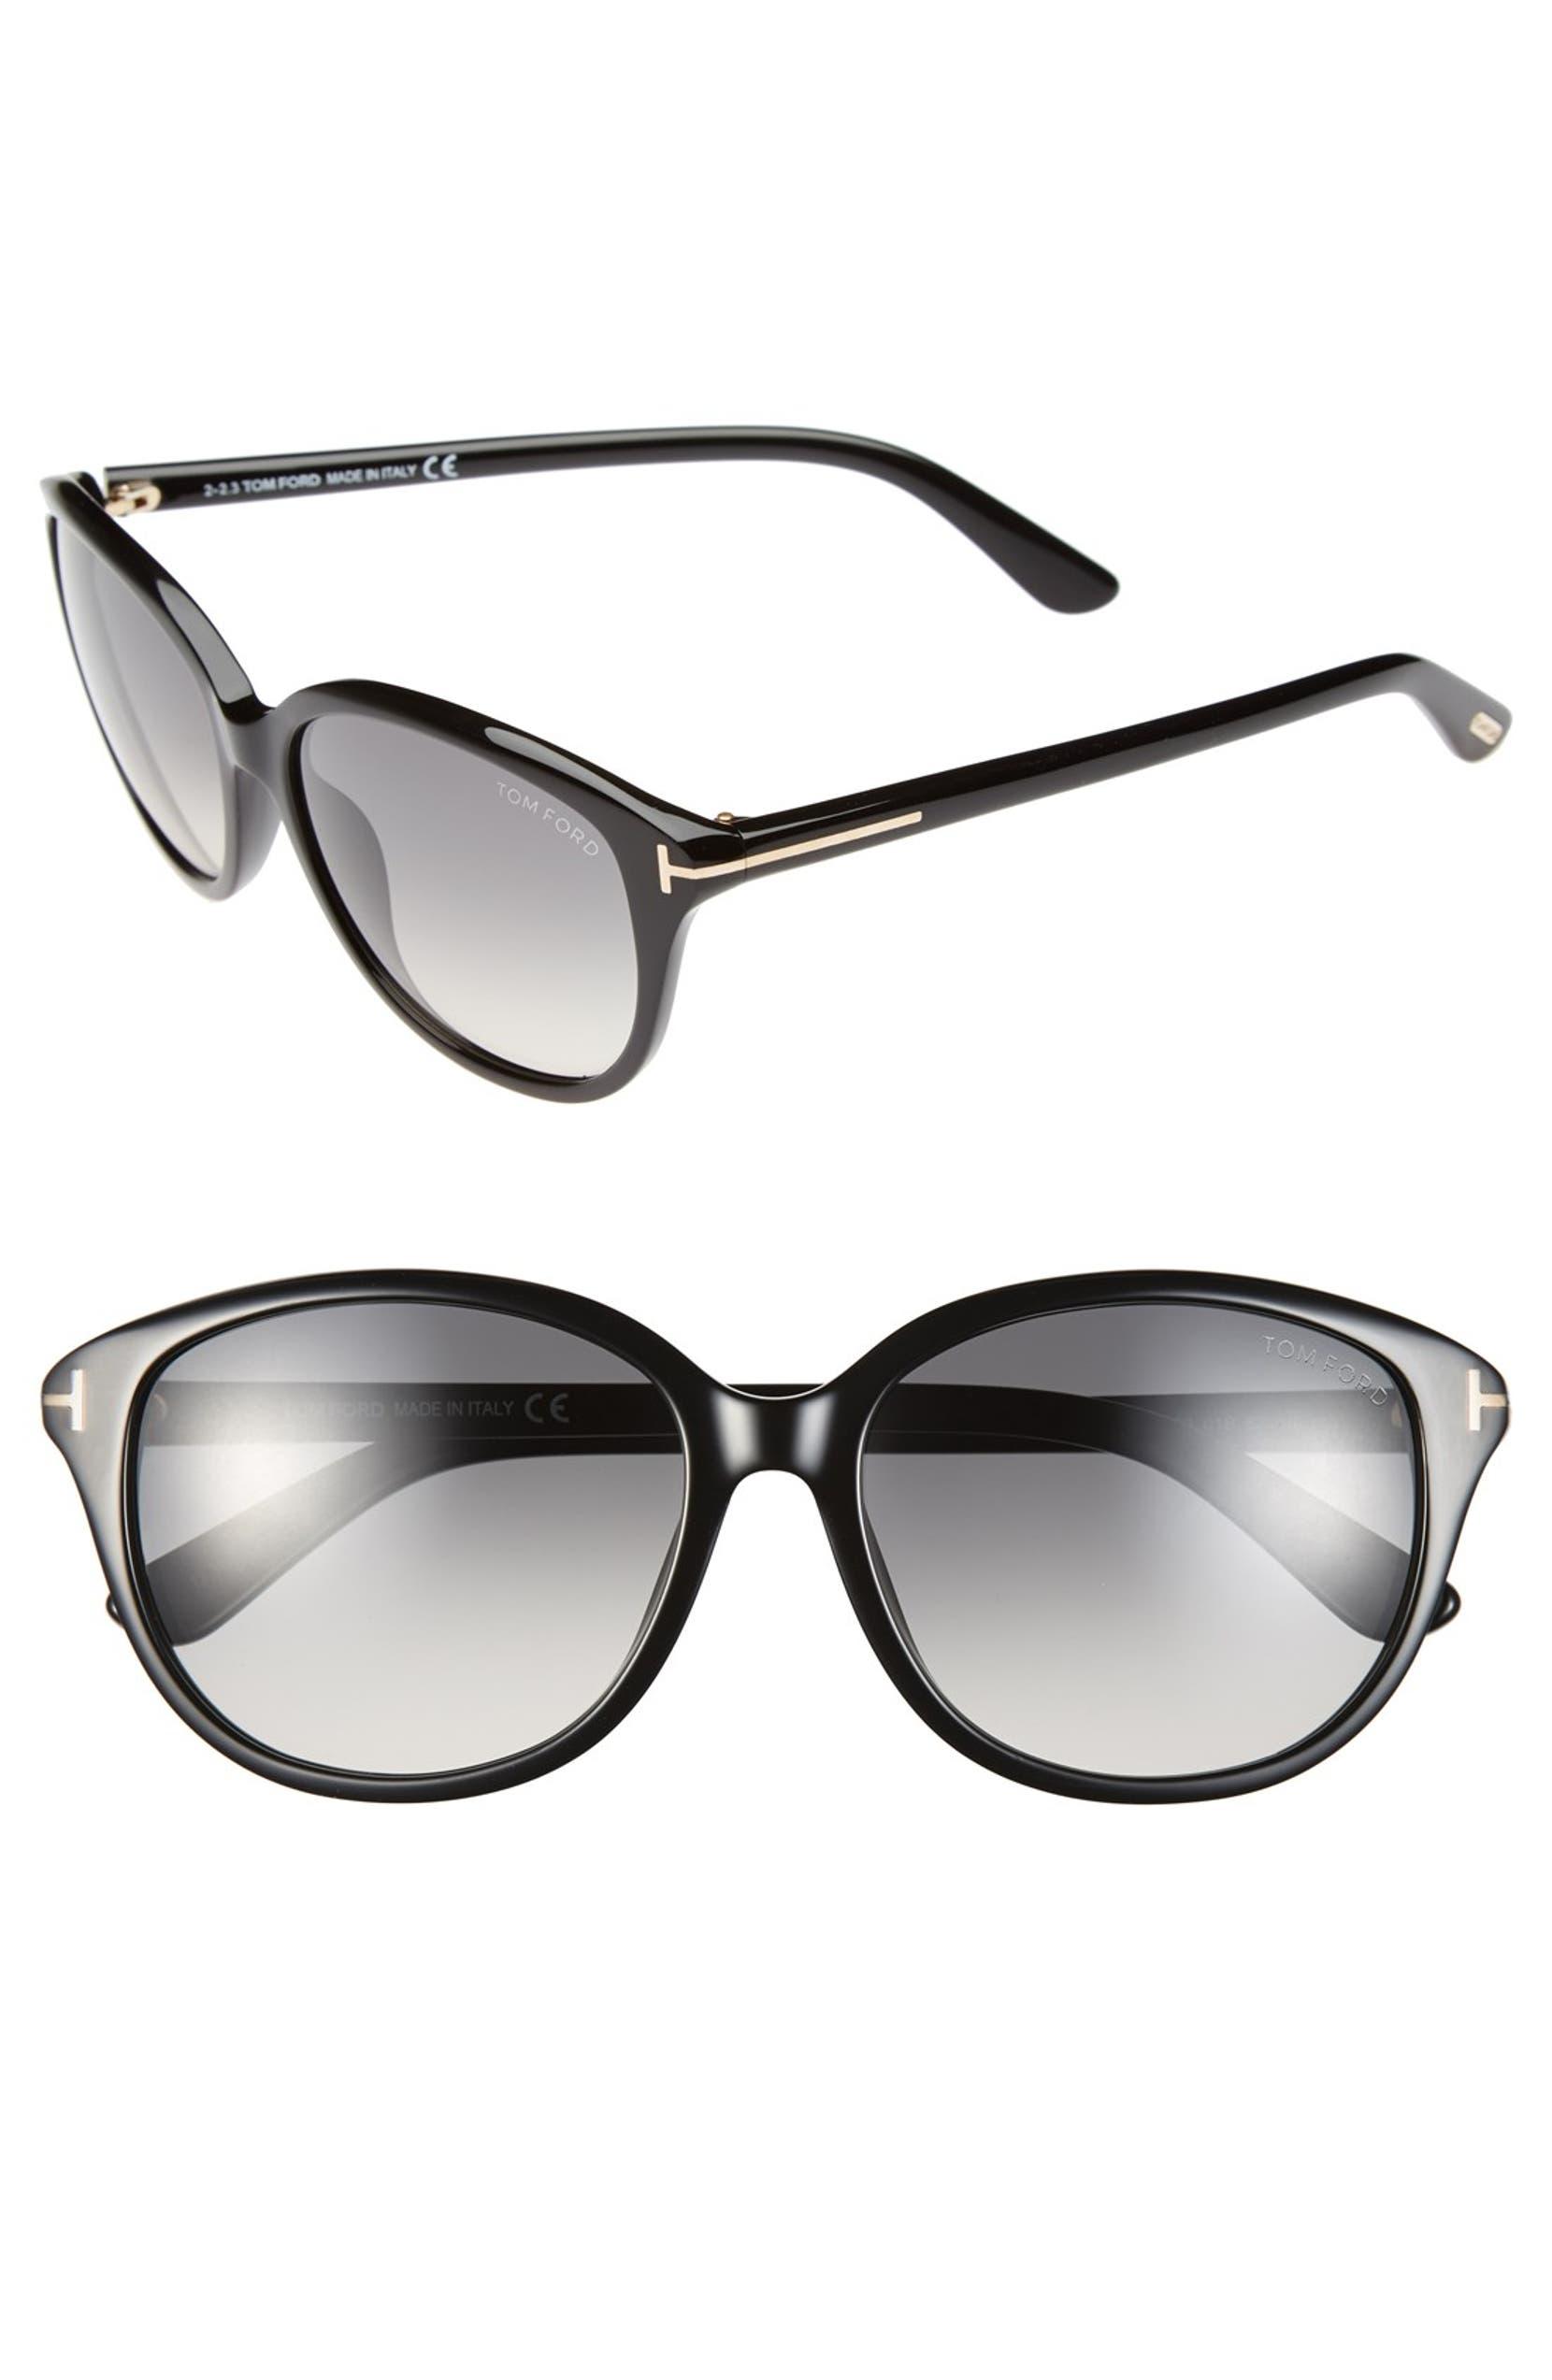 09fa6bb173af Nordstrom Sunglasses  karmen  Tom Ford 57mm qwIAOvxt